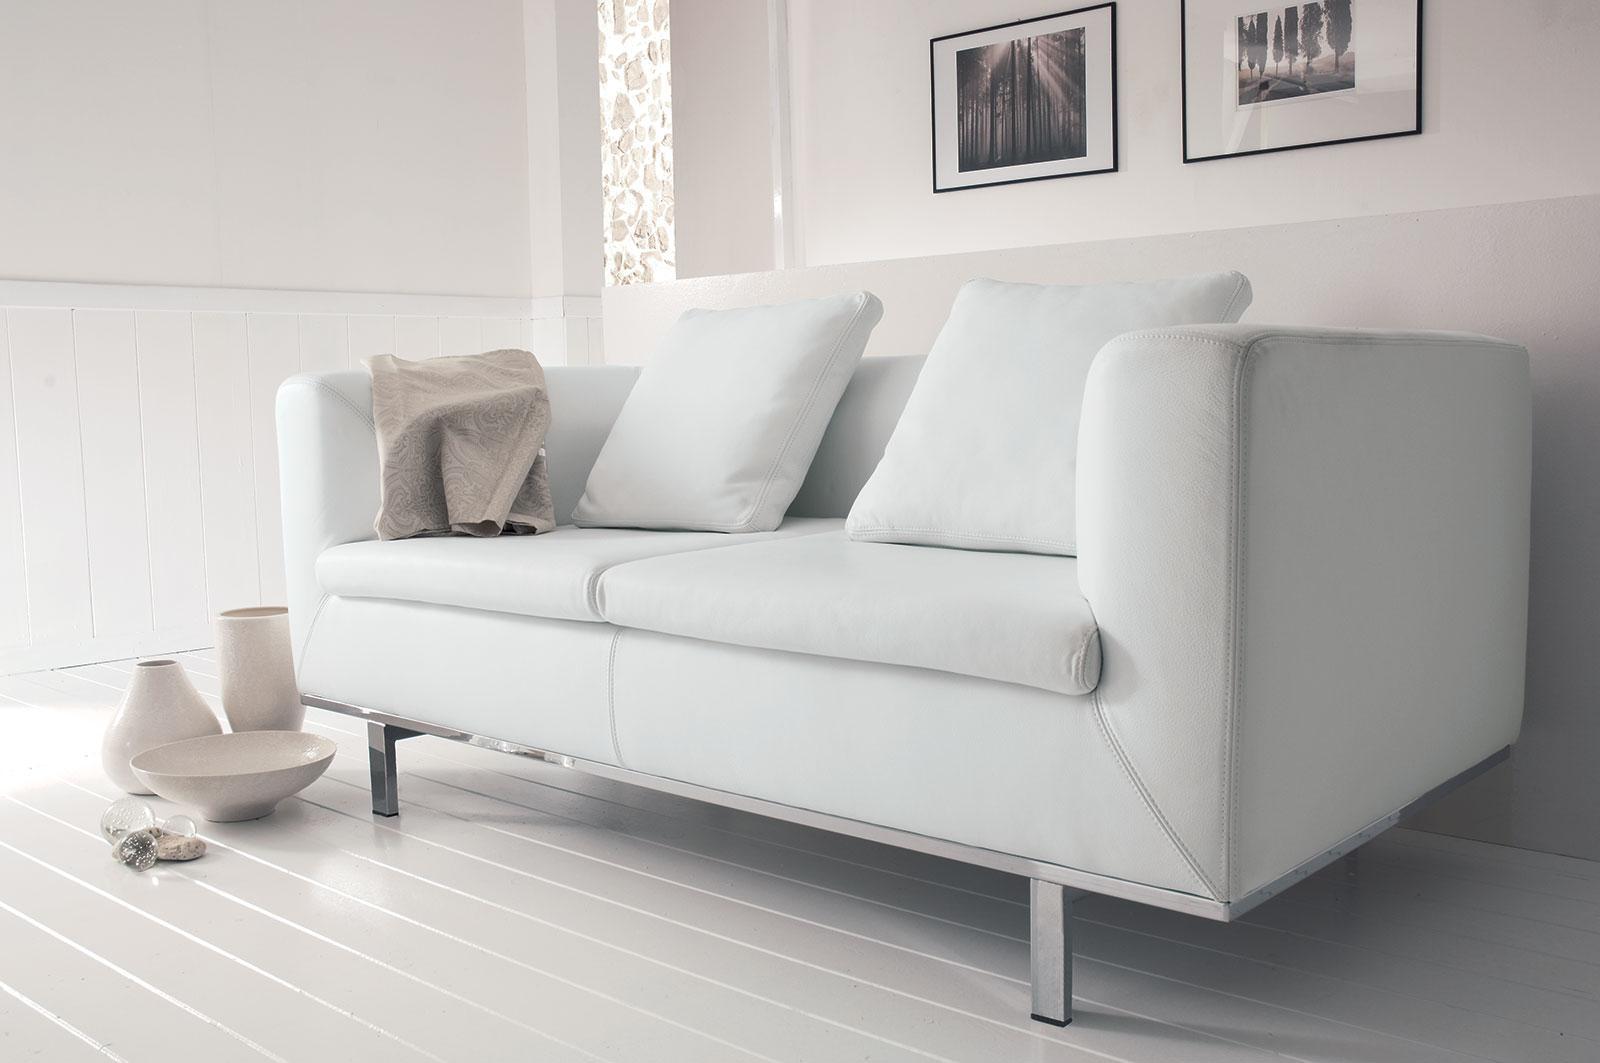 Miami 2 Seater Soft Leather Sofa | Shop Online - Italy Dream Design